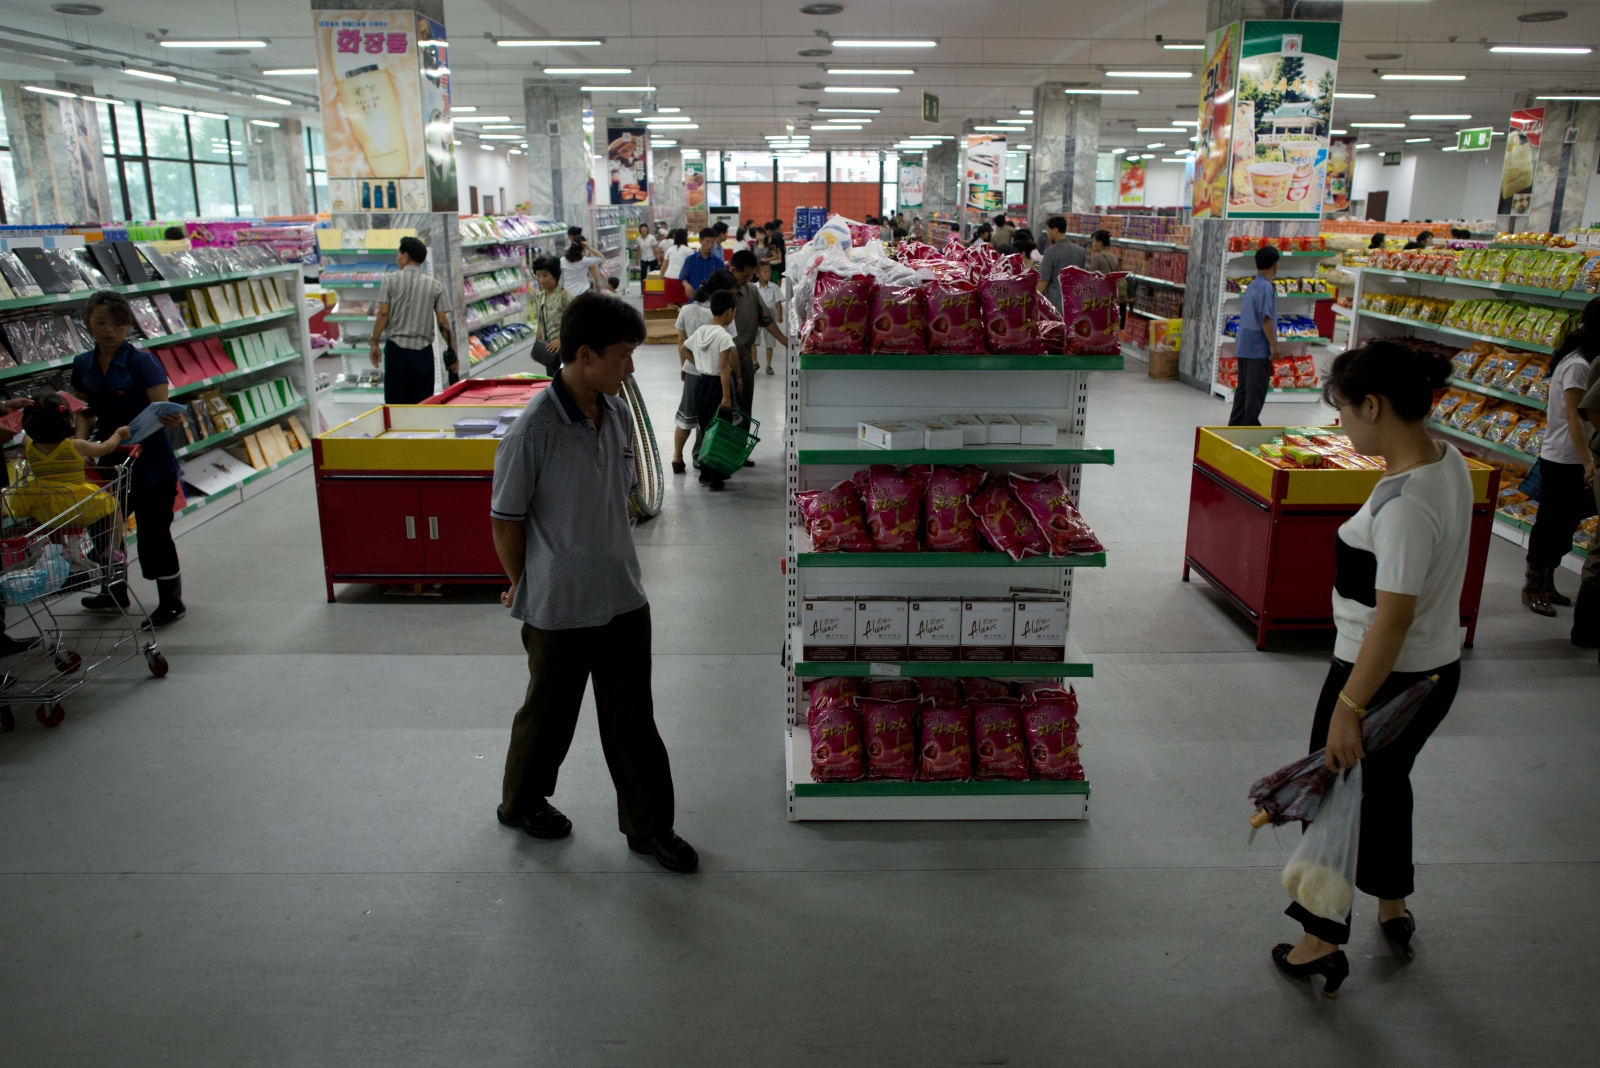 North Korea market